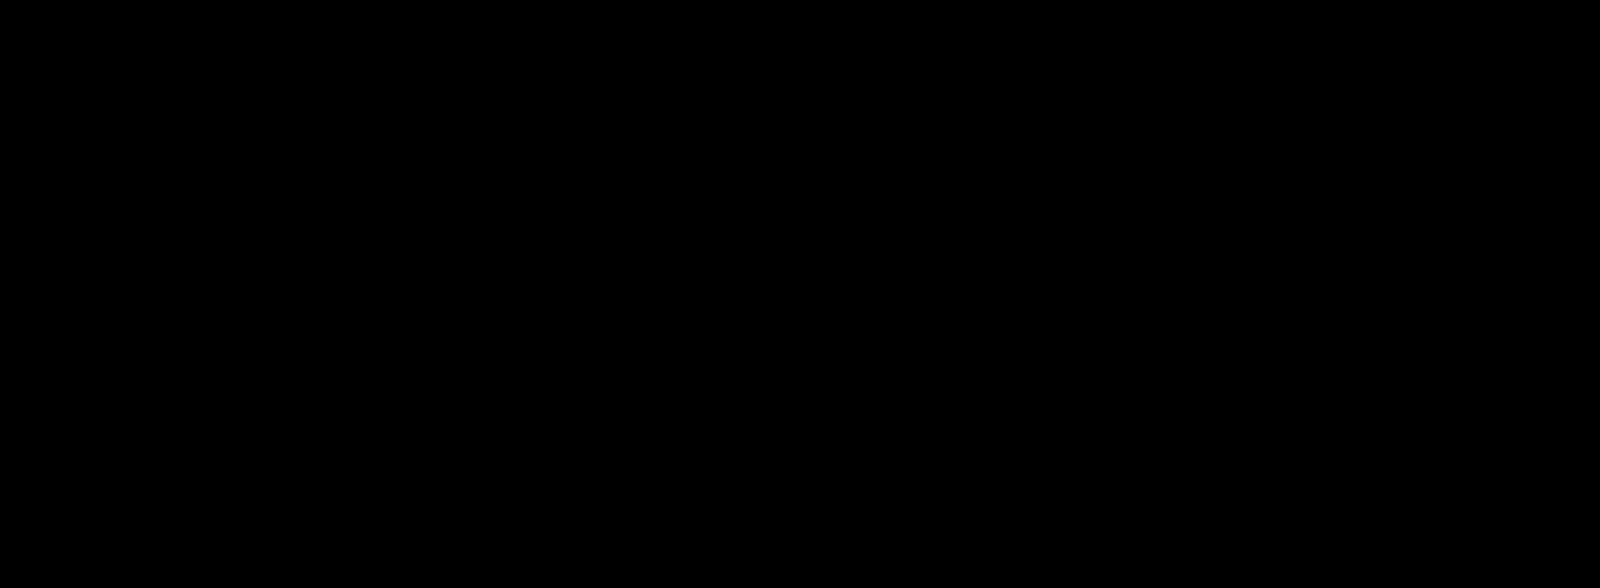 1600x588 Wedding Bells Clip Art Clipart Panda